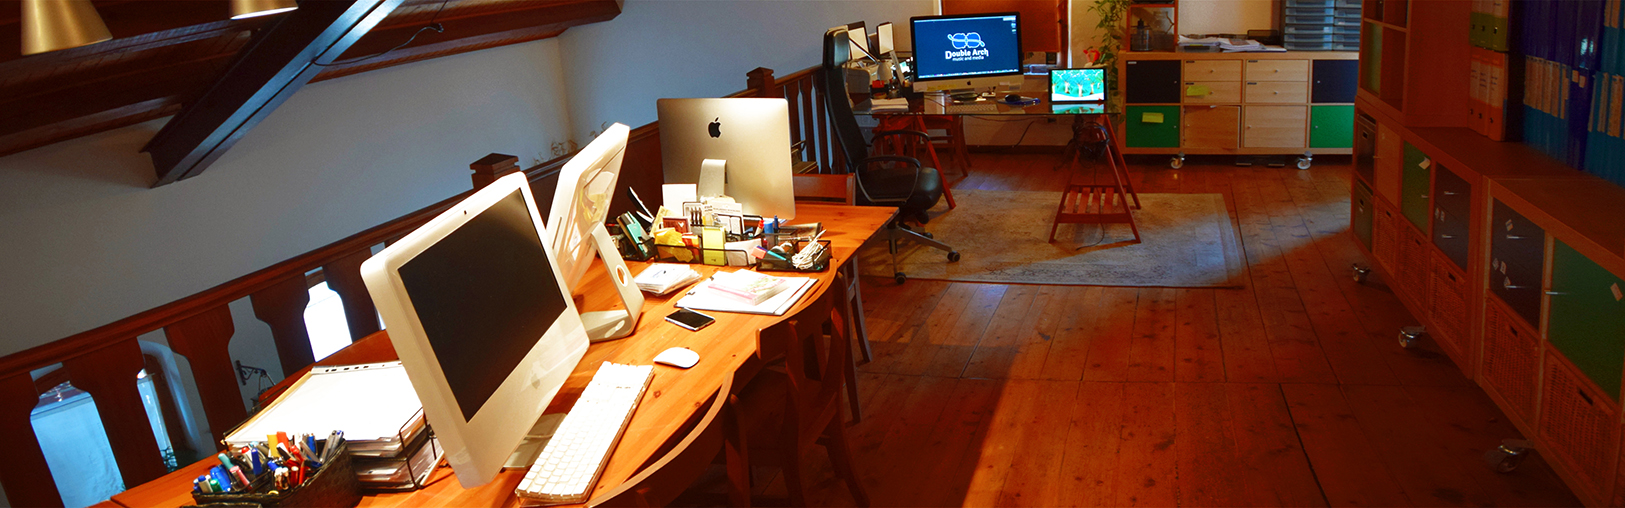 Double Arch:la sala Graphic design